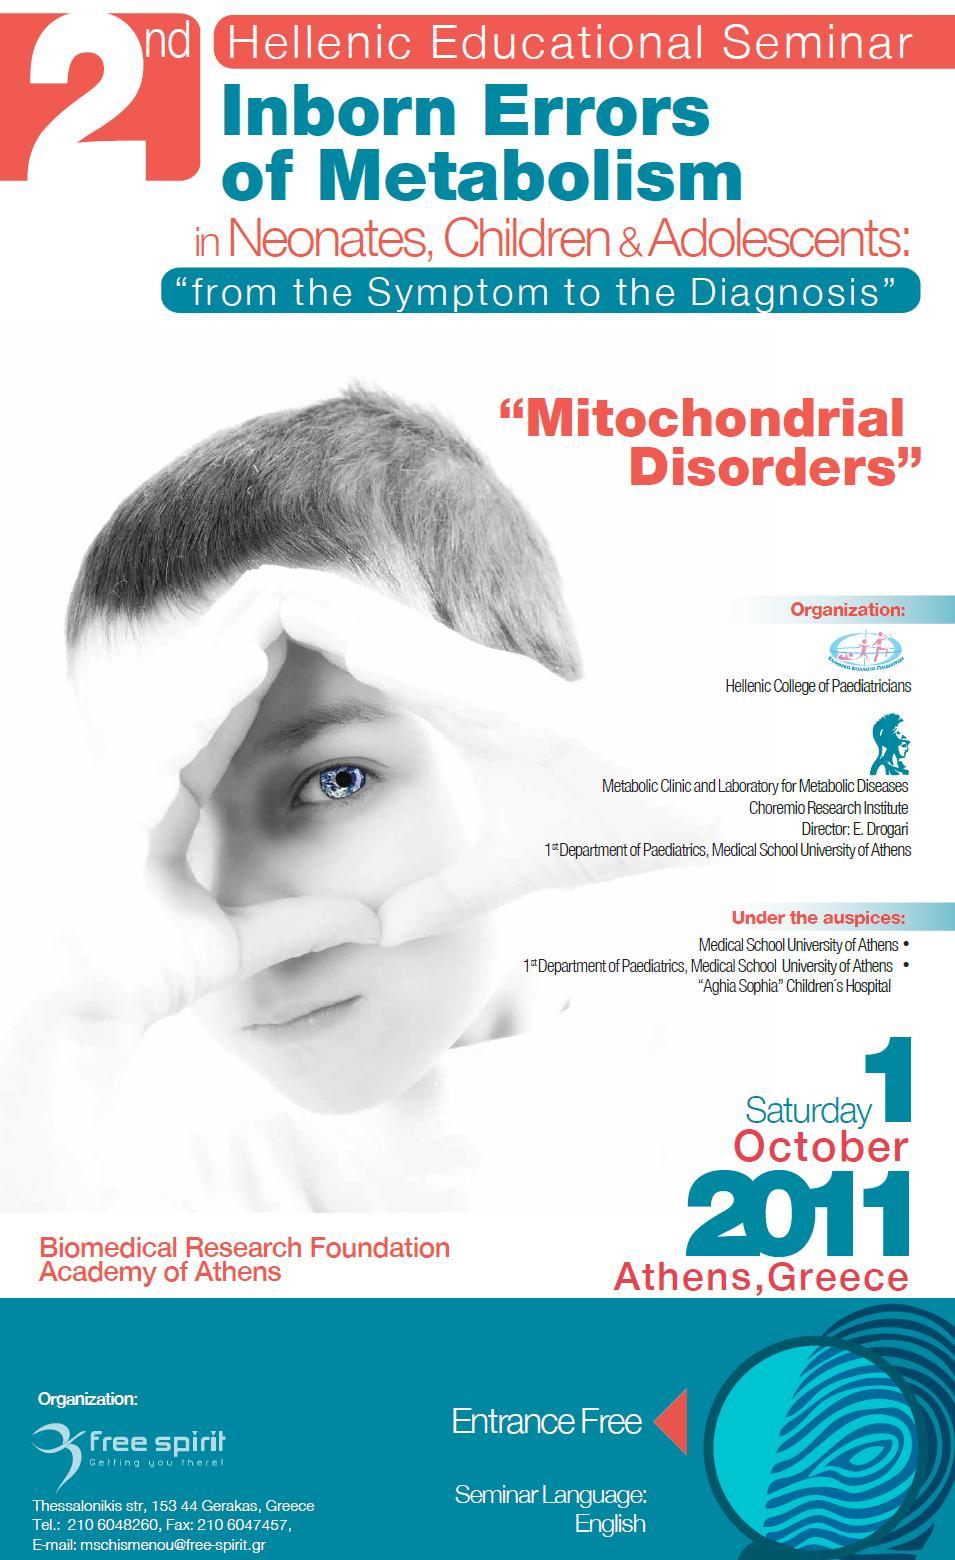 2nd Hellenic Educational Seminar Inborn errors of Metabolism in Neonates, Children & Adolescents